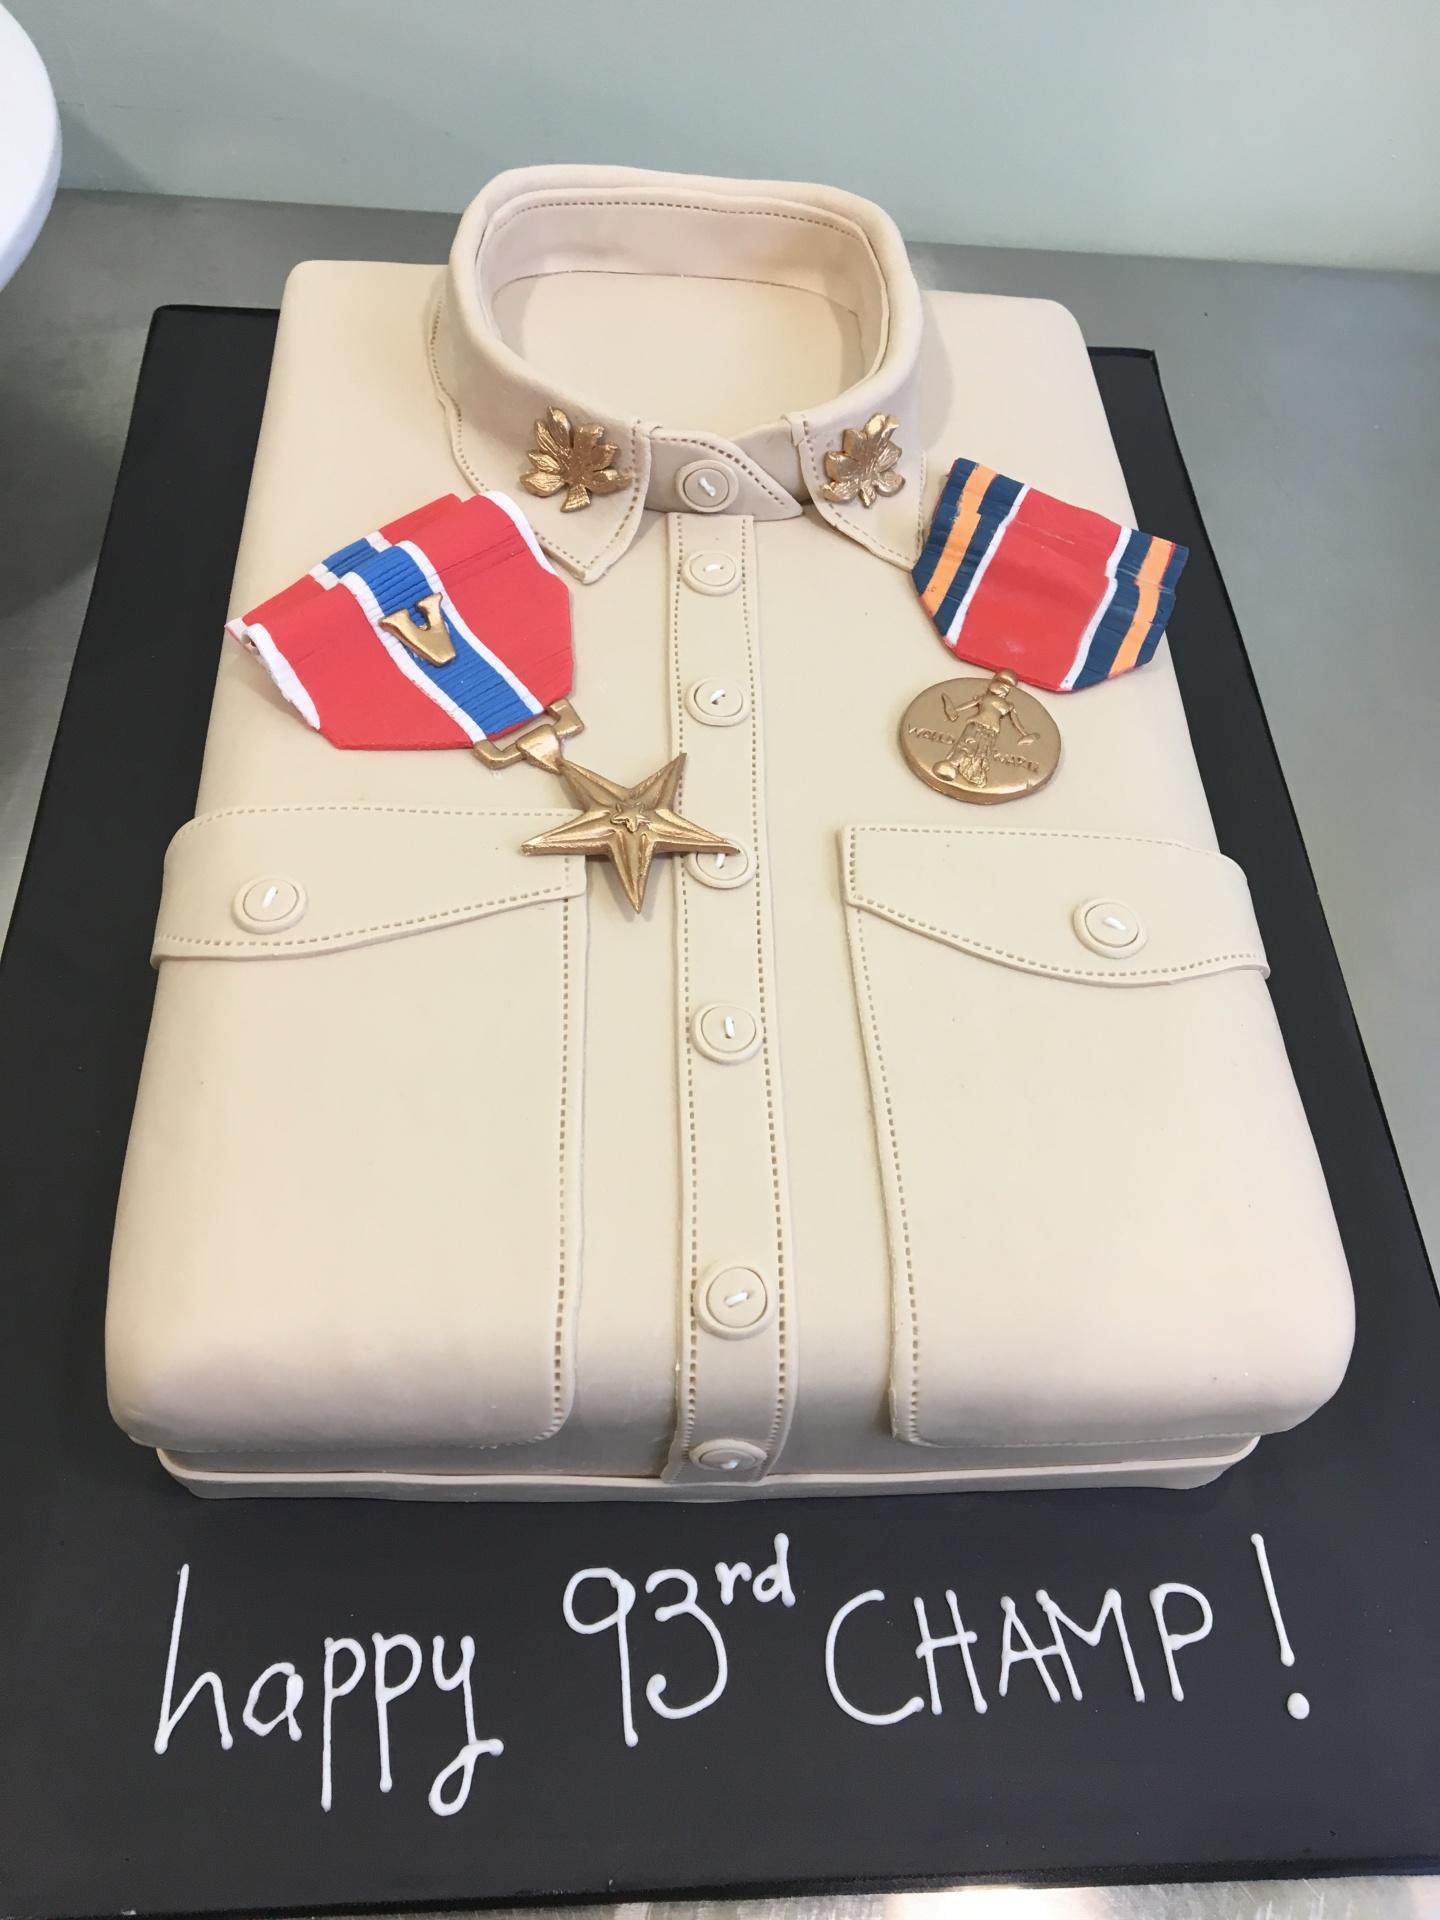 Custom Cakes NJ Army Shirt Cake with Fondant Medals